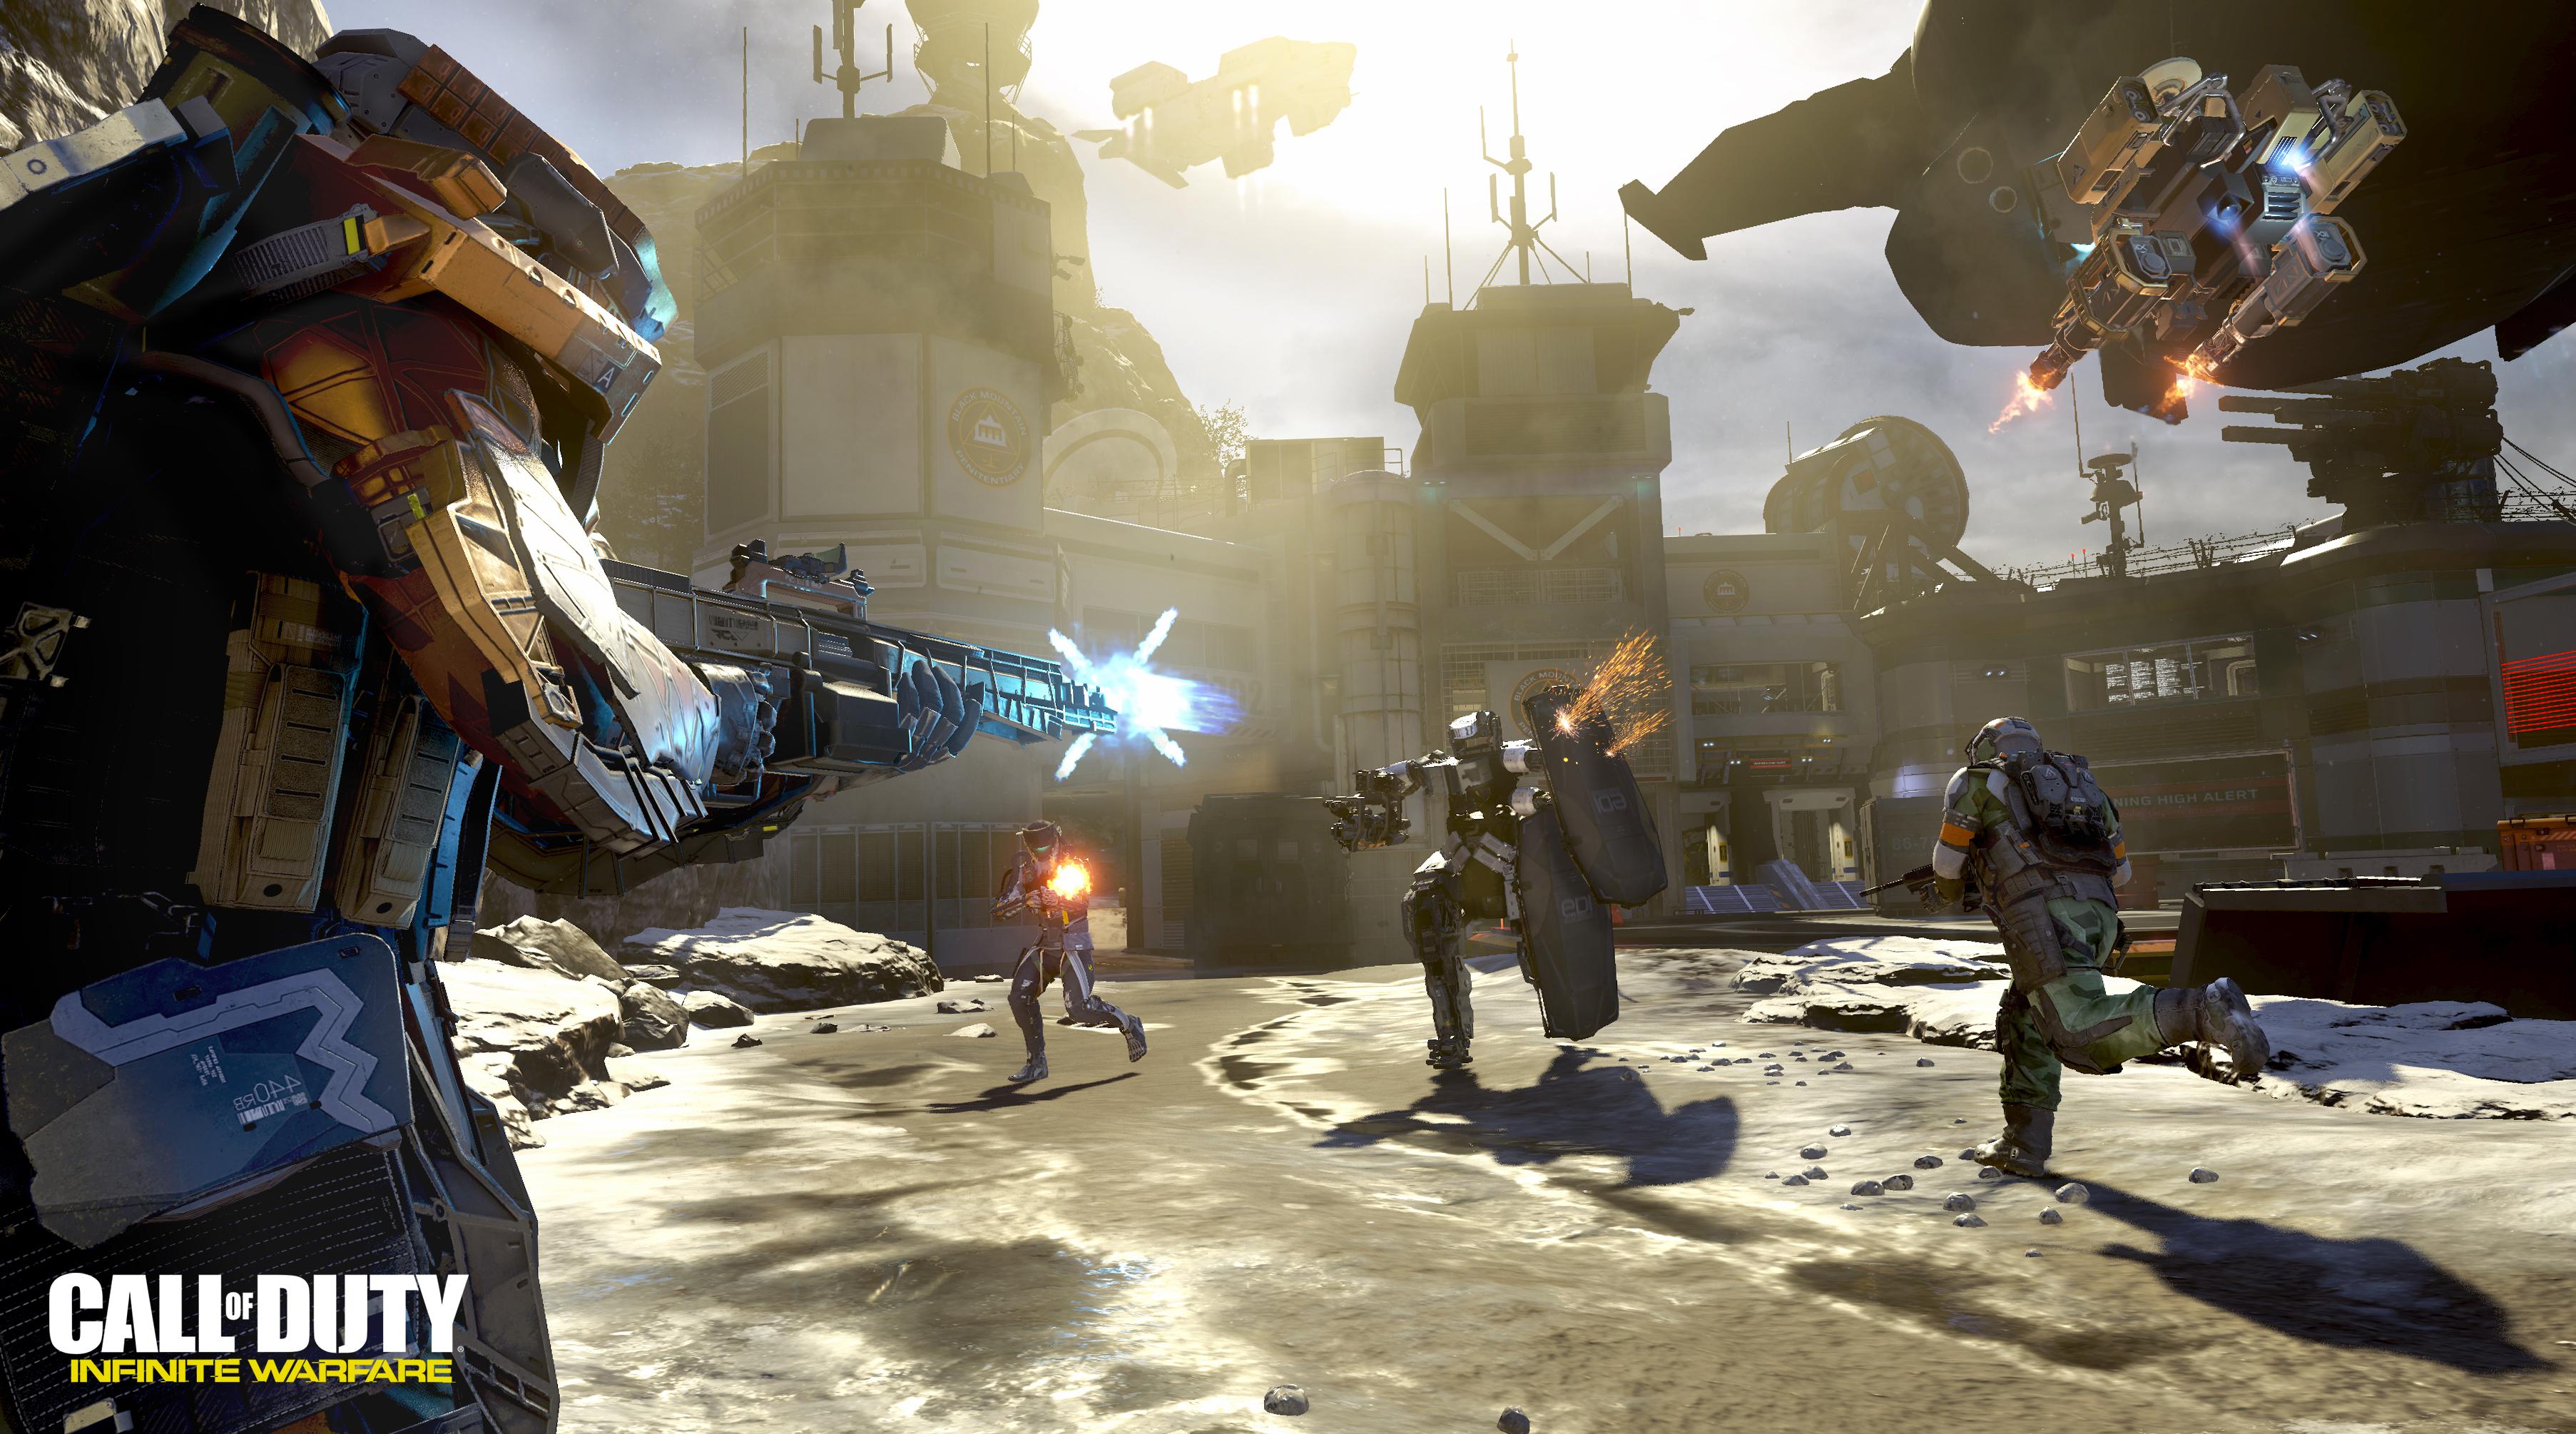 Nové gameplay záběry z kampaně Call of Duty: Infinite Warfare 130063